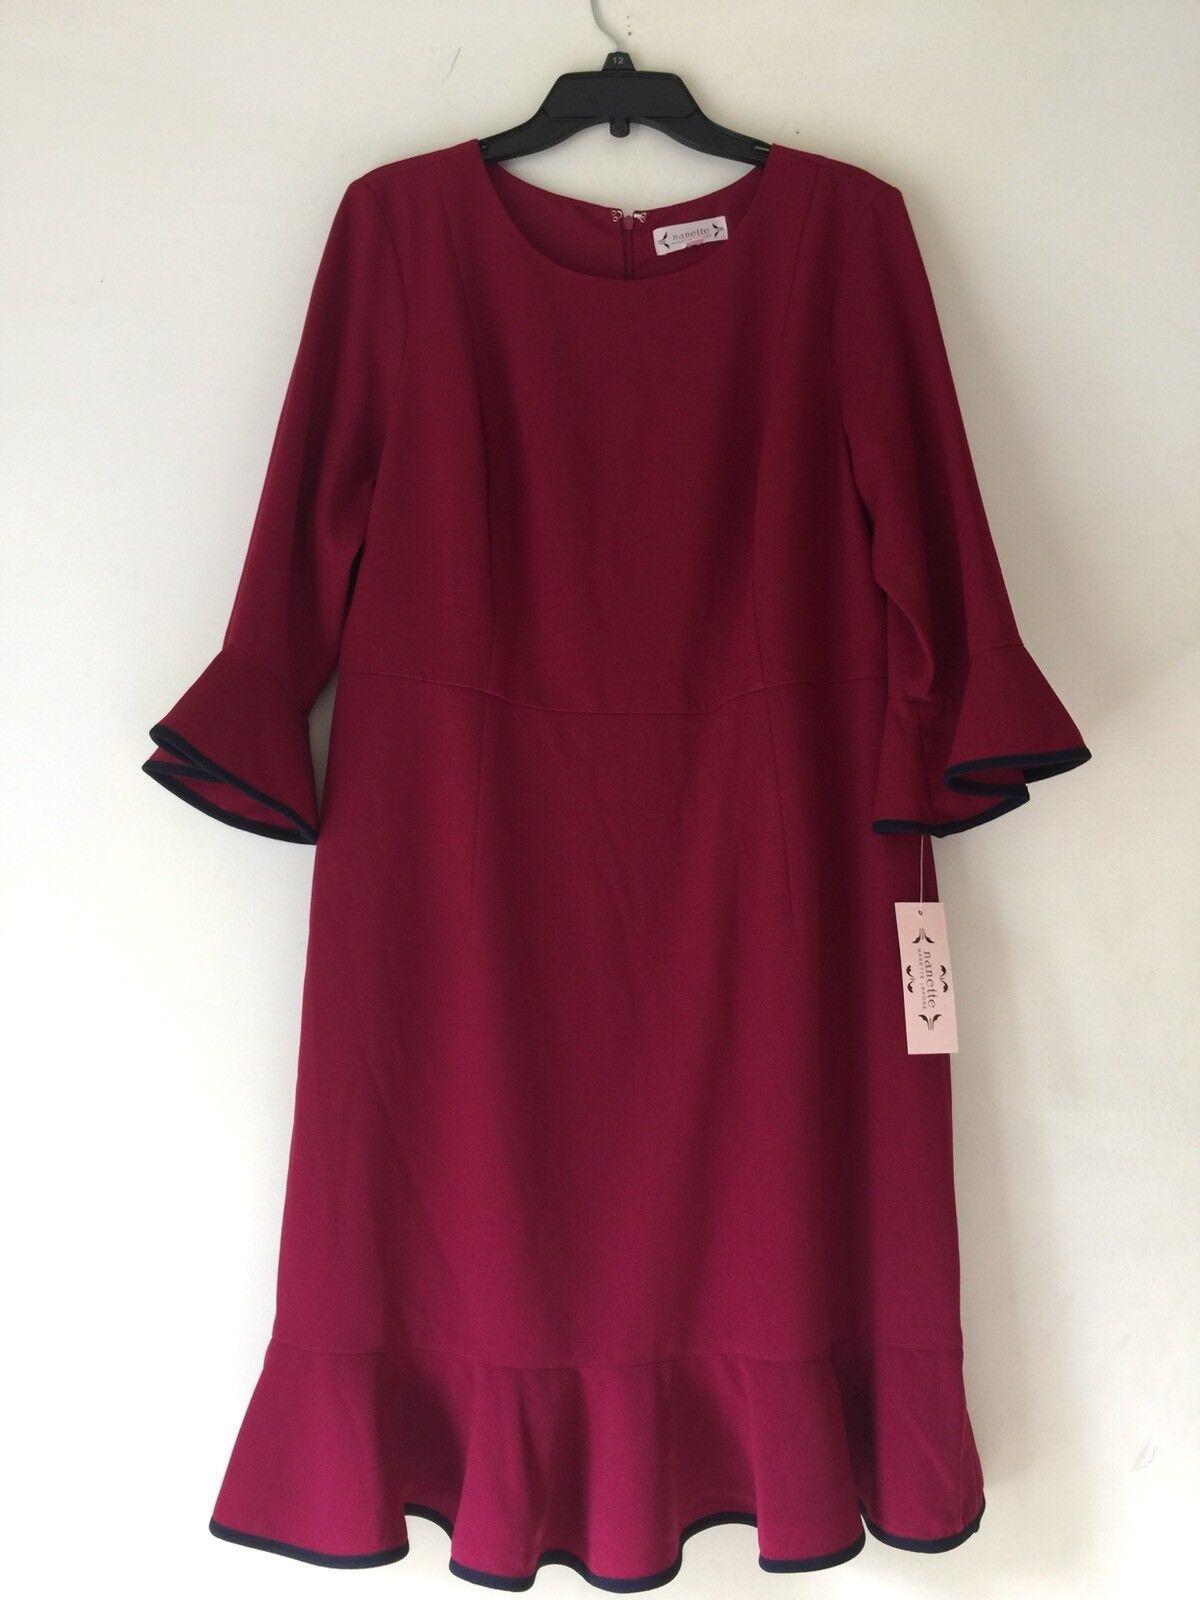 Nanette nanette Lepore Three-Quarter Sleeve Flounce Dress. Größe 16.